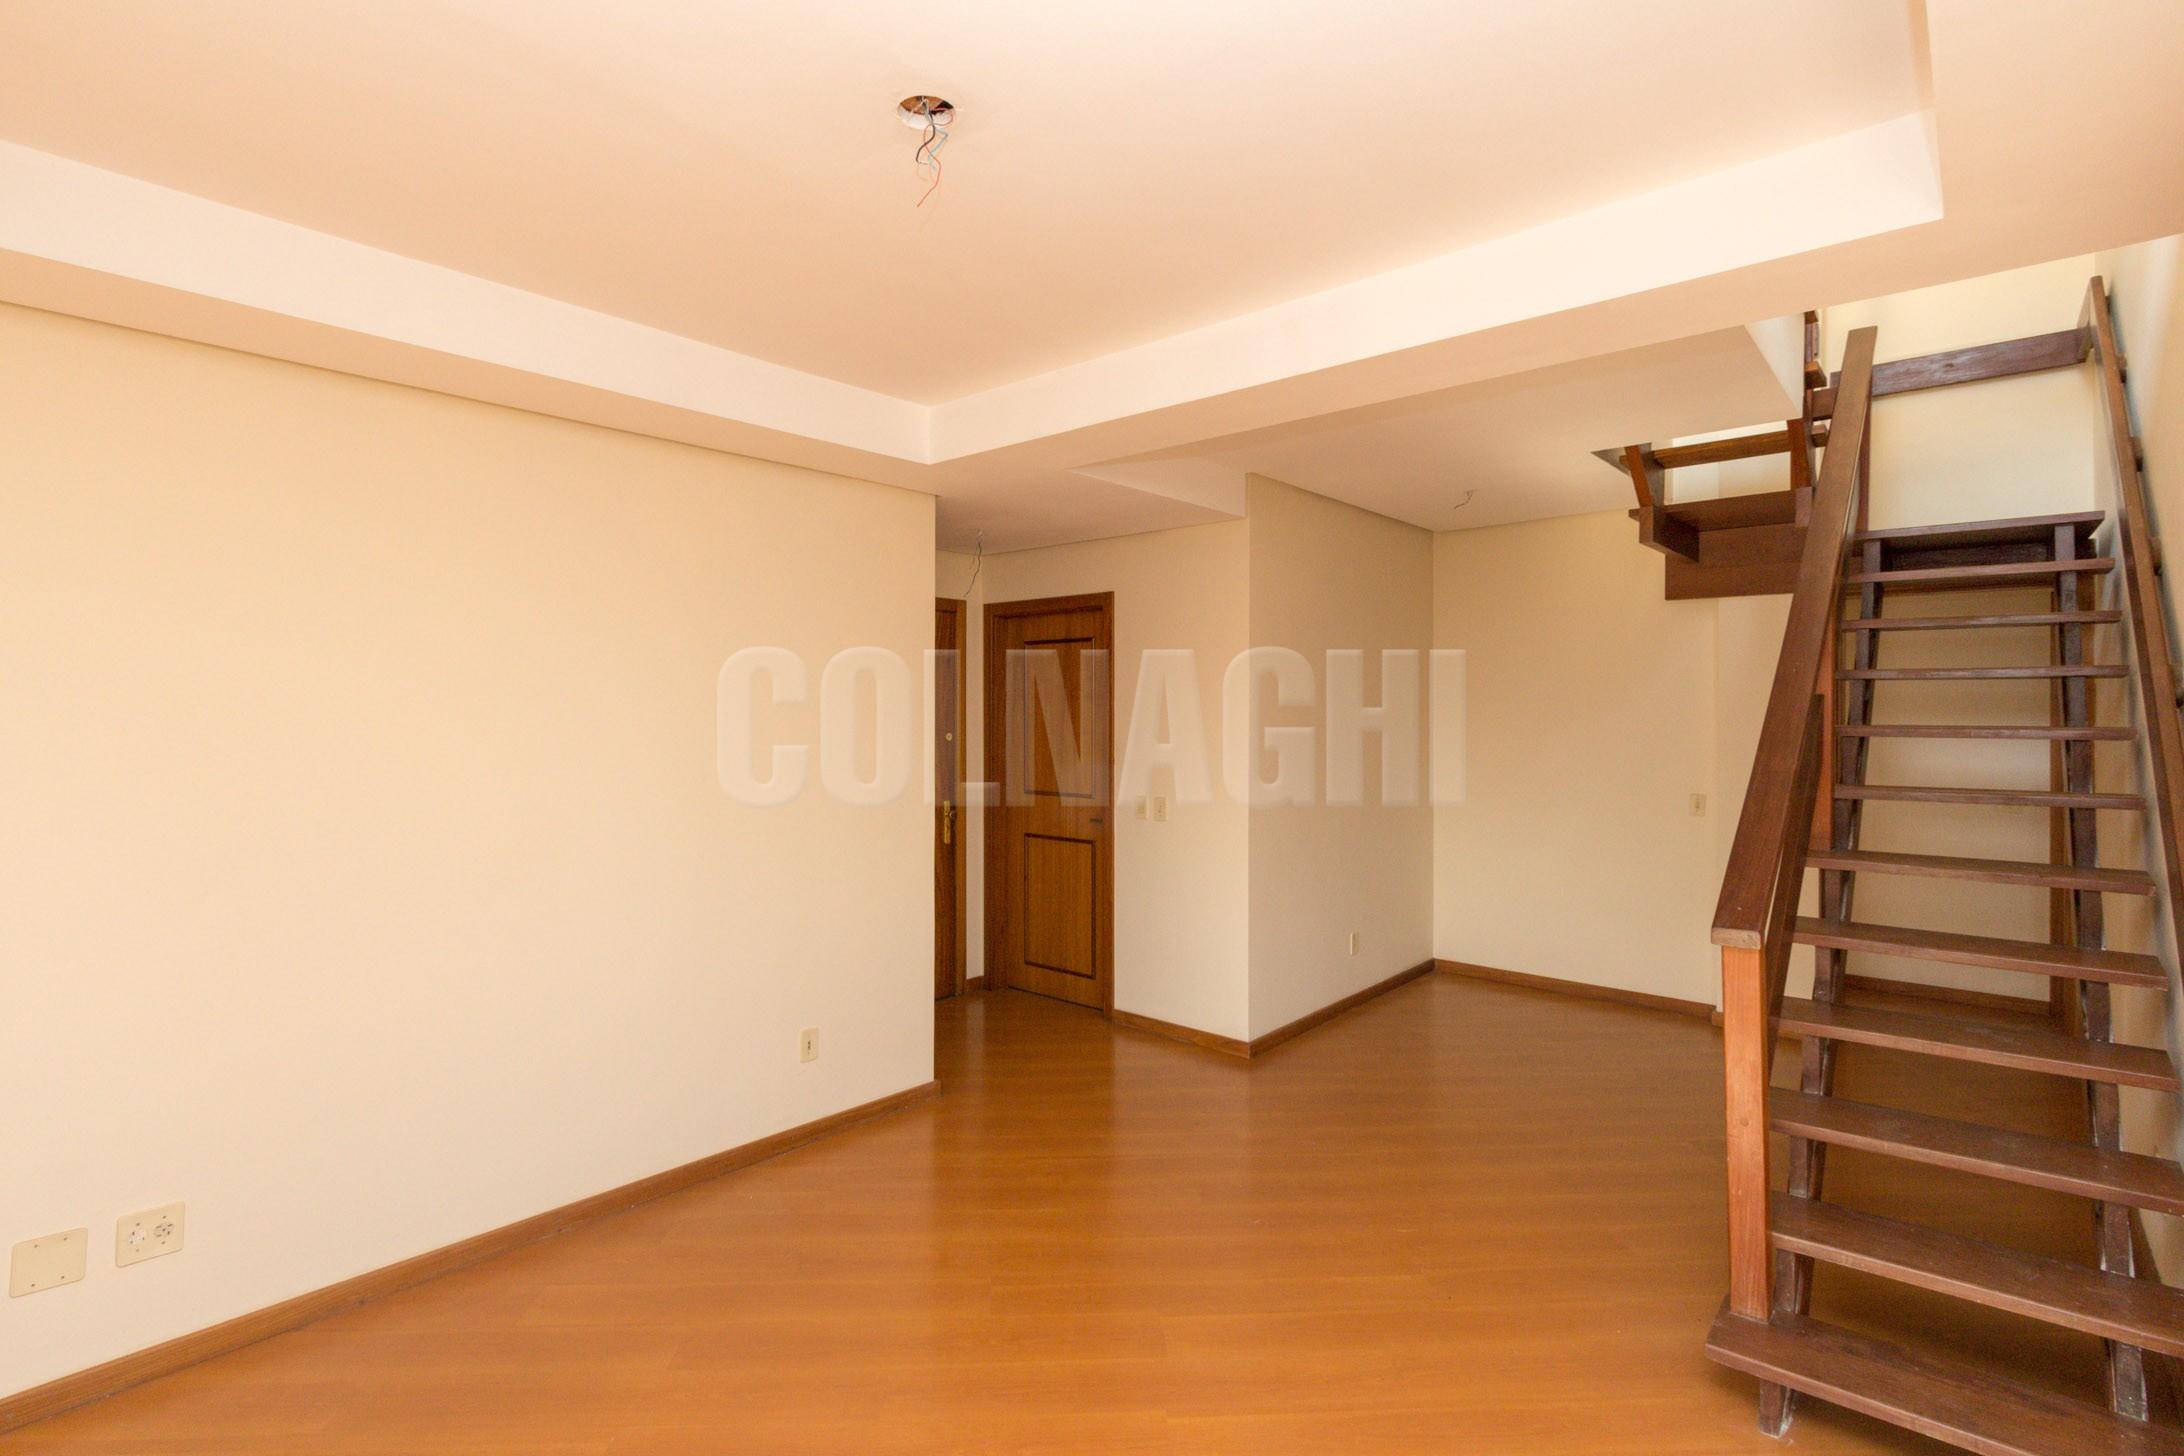 Giverny - Cobertura 3 Dorm, Rio Branco, Porto Alegre (cl13722) - Foto 3